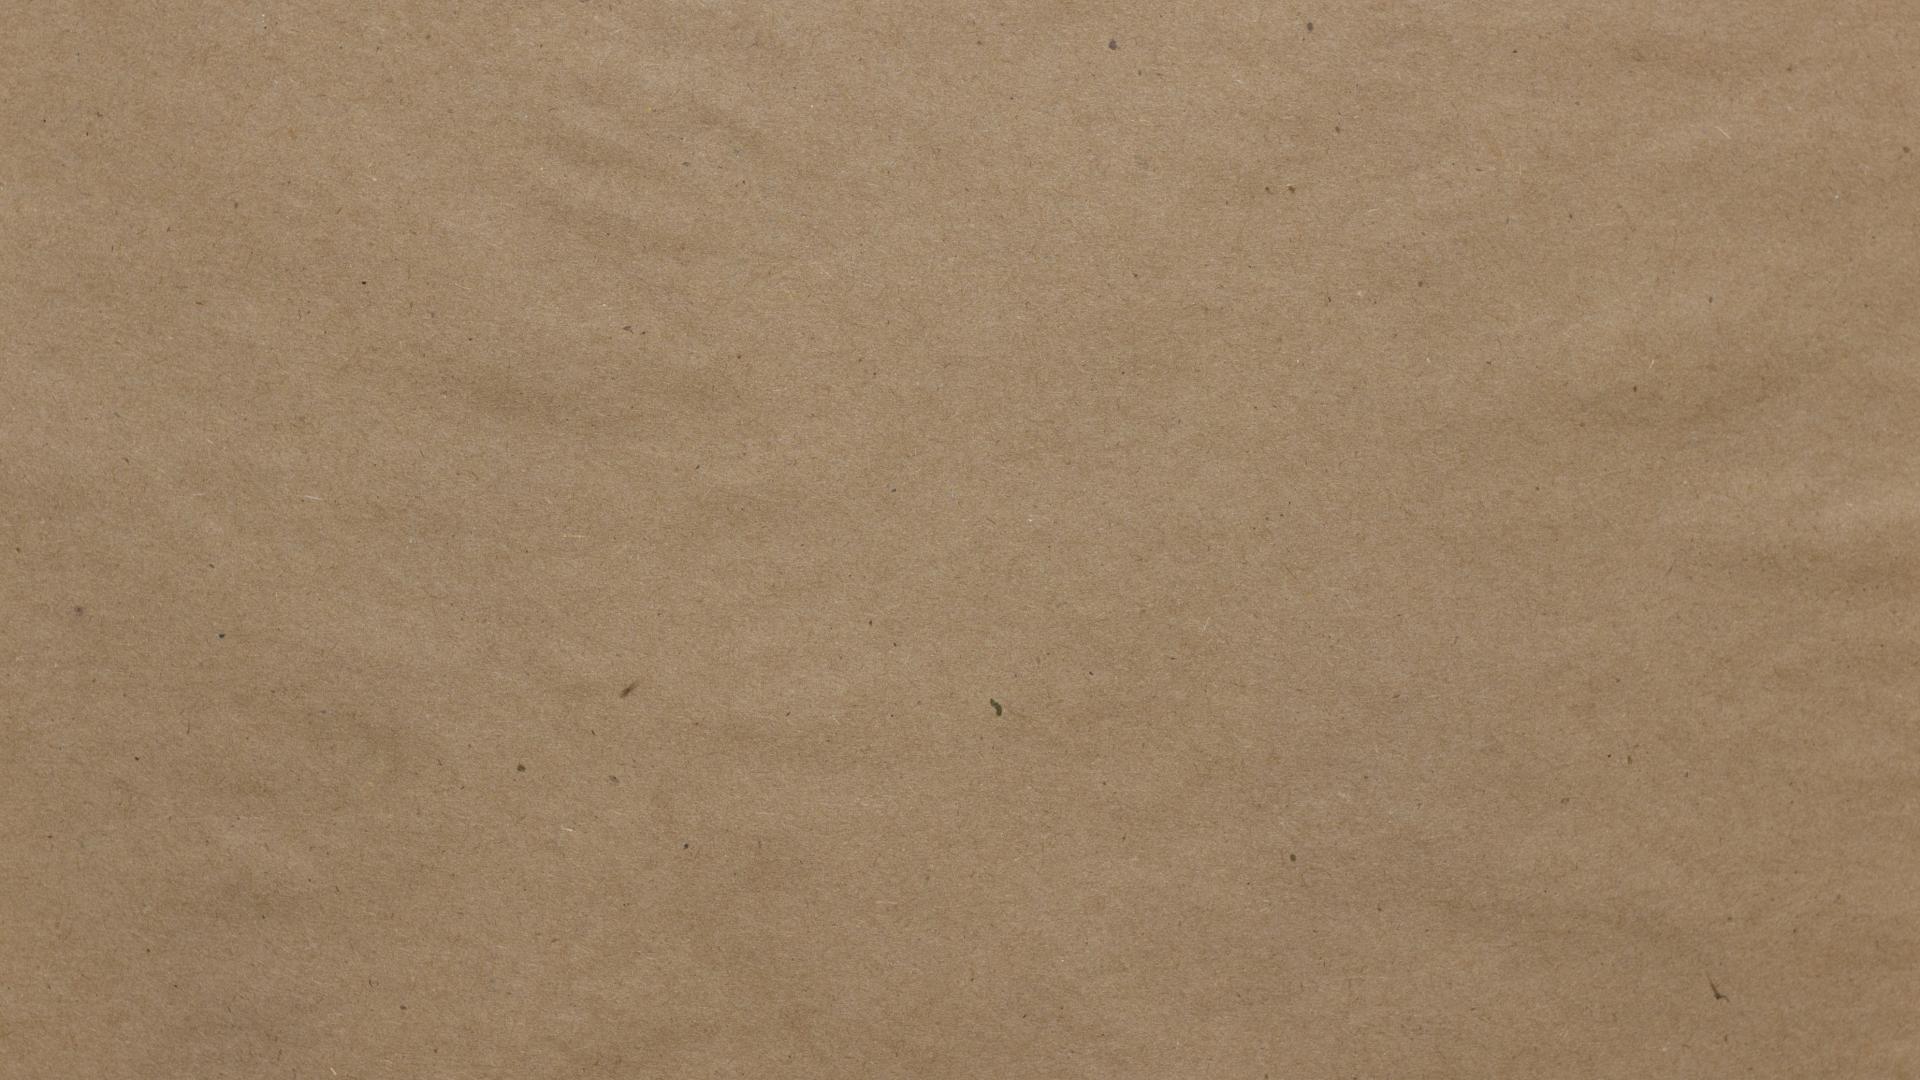 Brown Craft Paper Texture 001